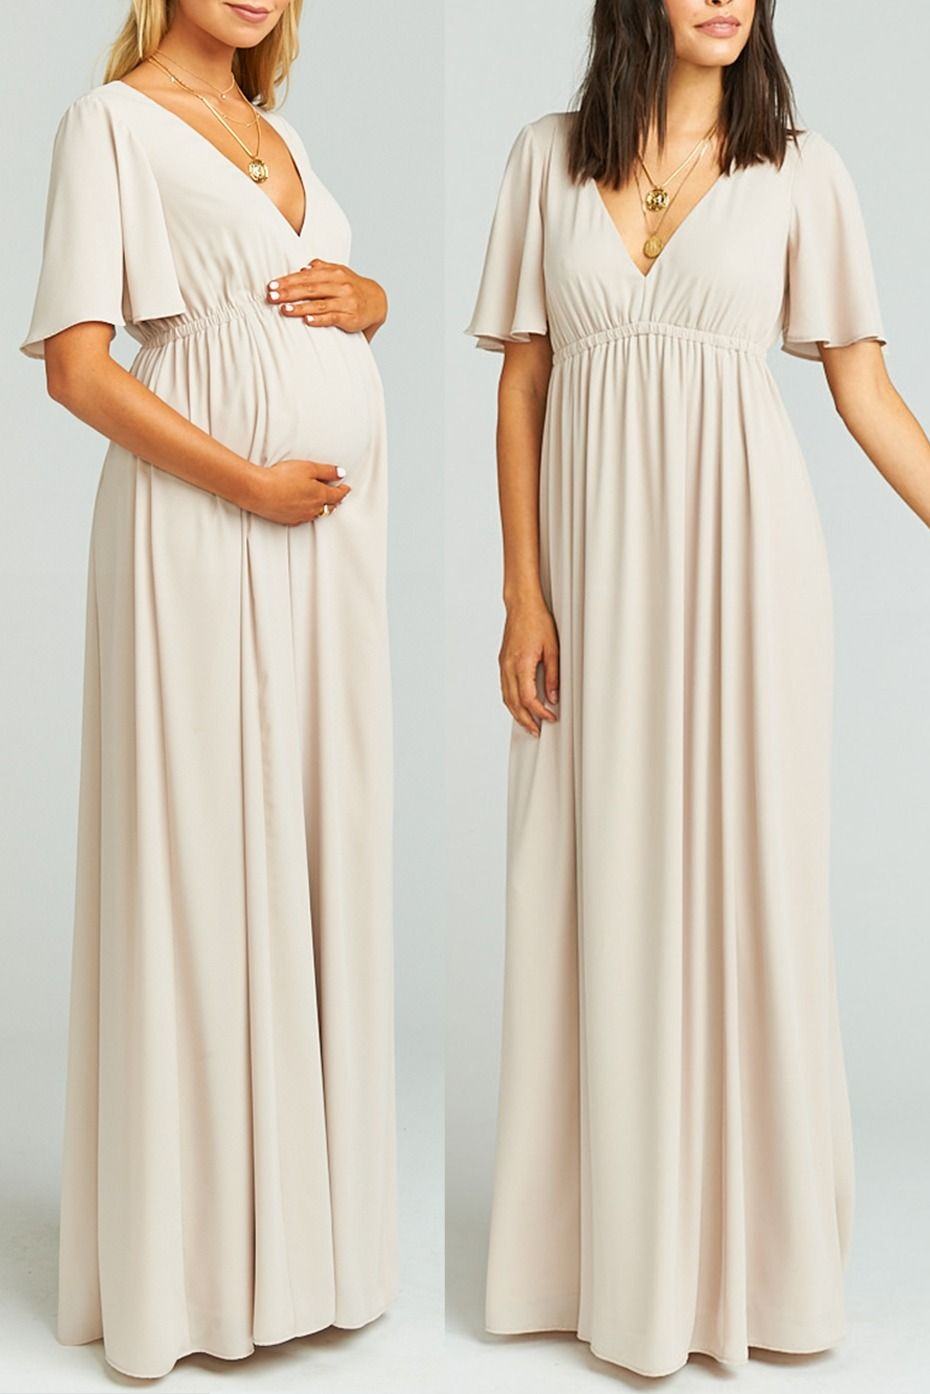 11++ Pregnant bridesmaids dress ideas in 2021